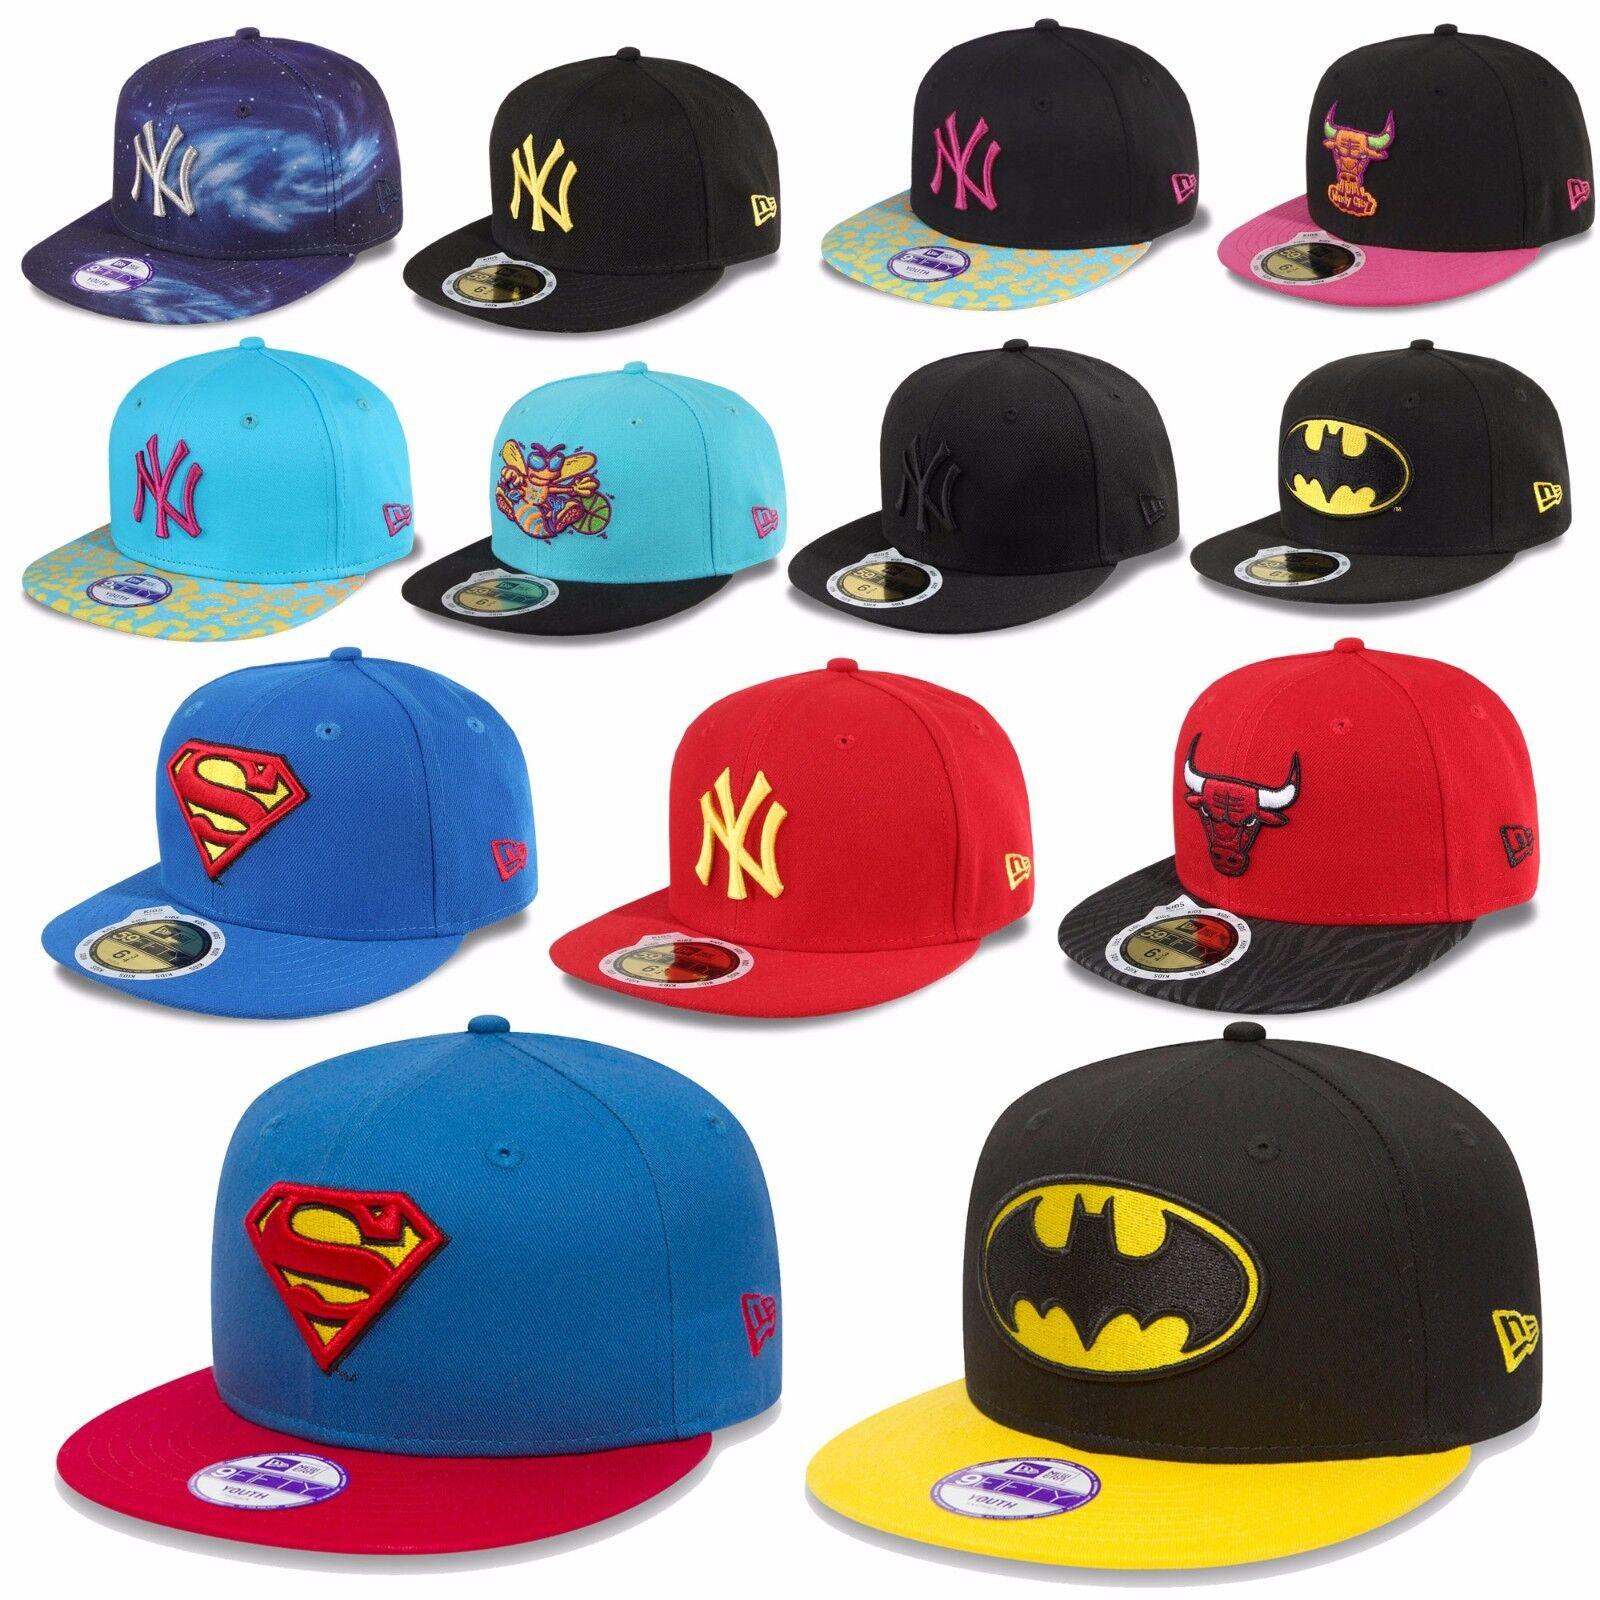 New Era Kinder Cap Snapback 59fifty Jungen Mädchen Yankees Batman Superman Bulls